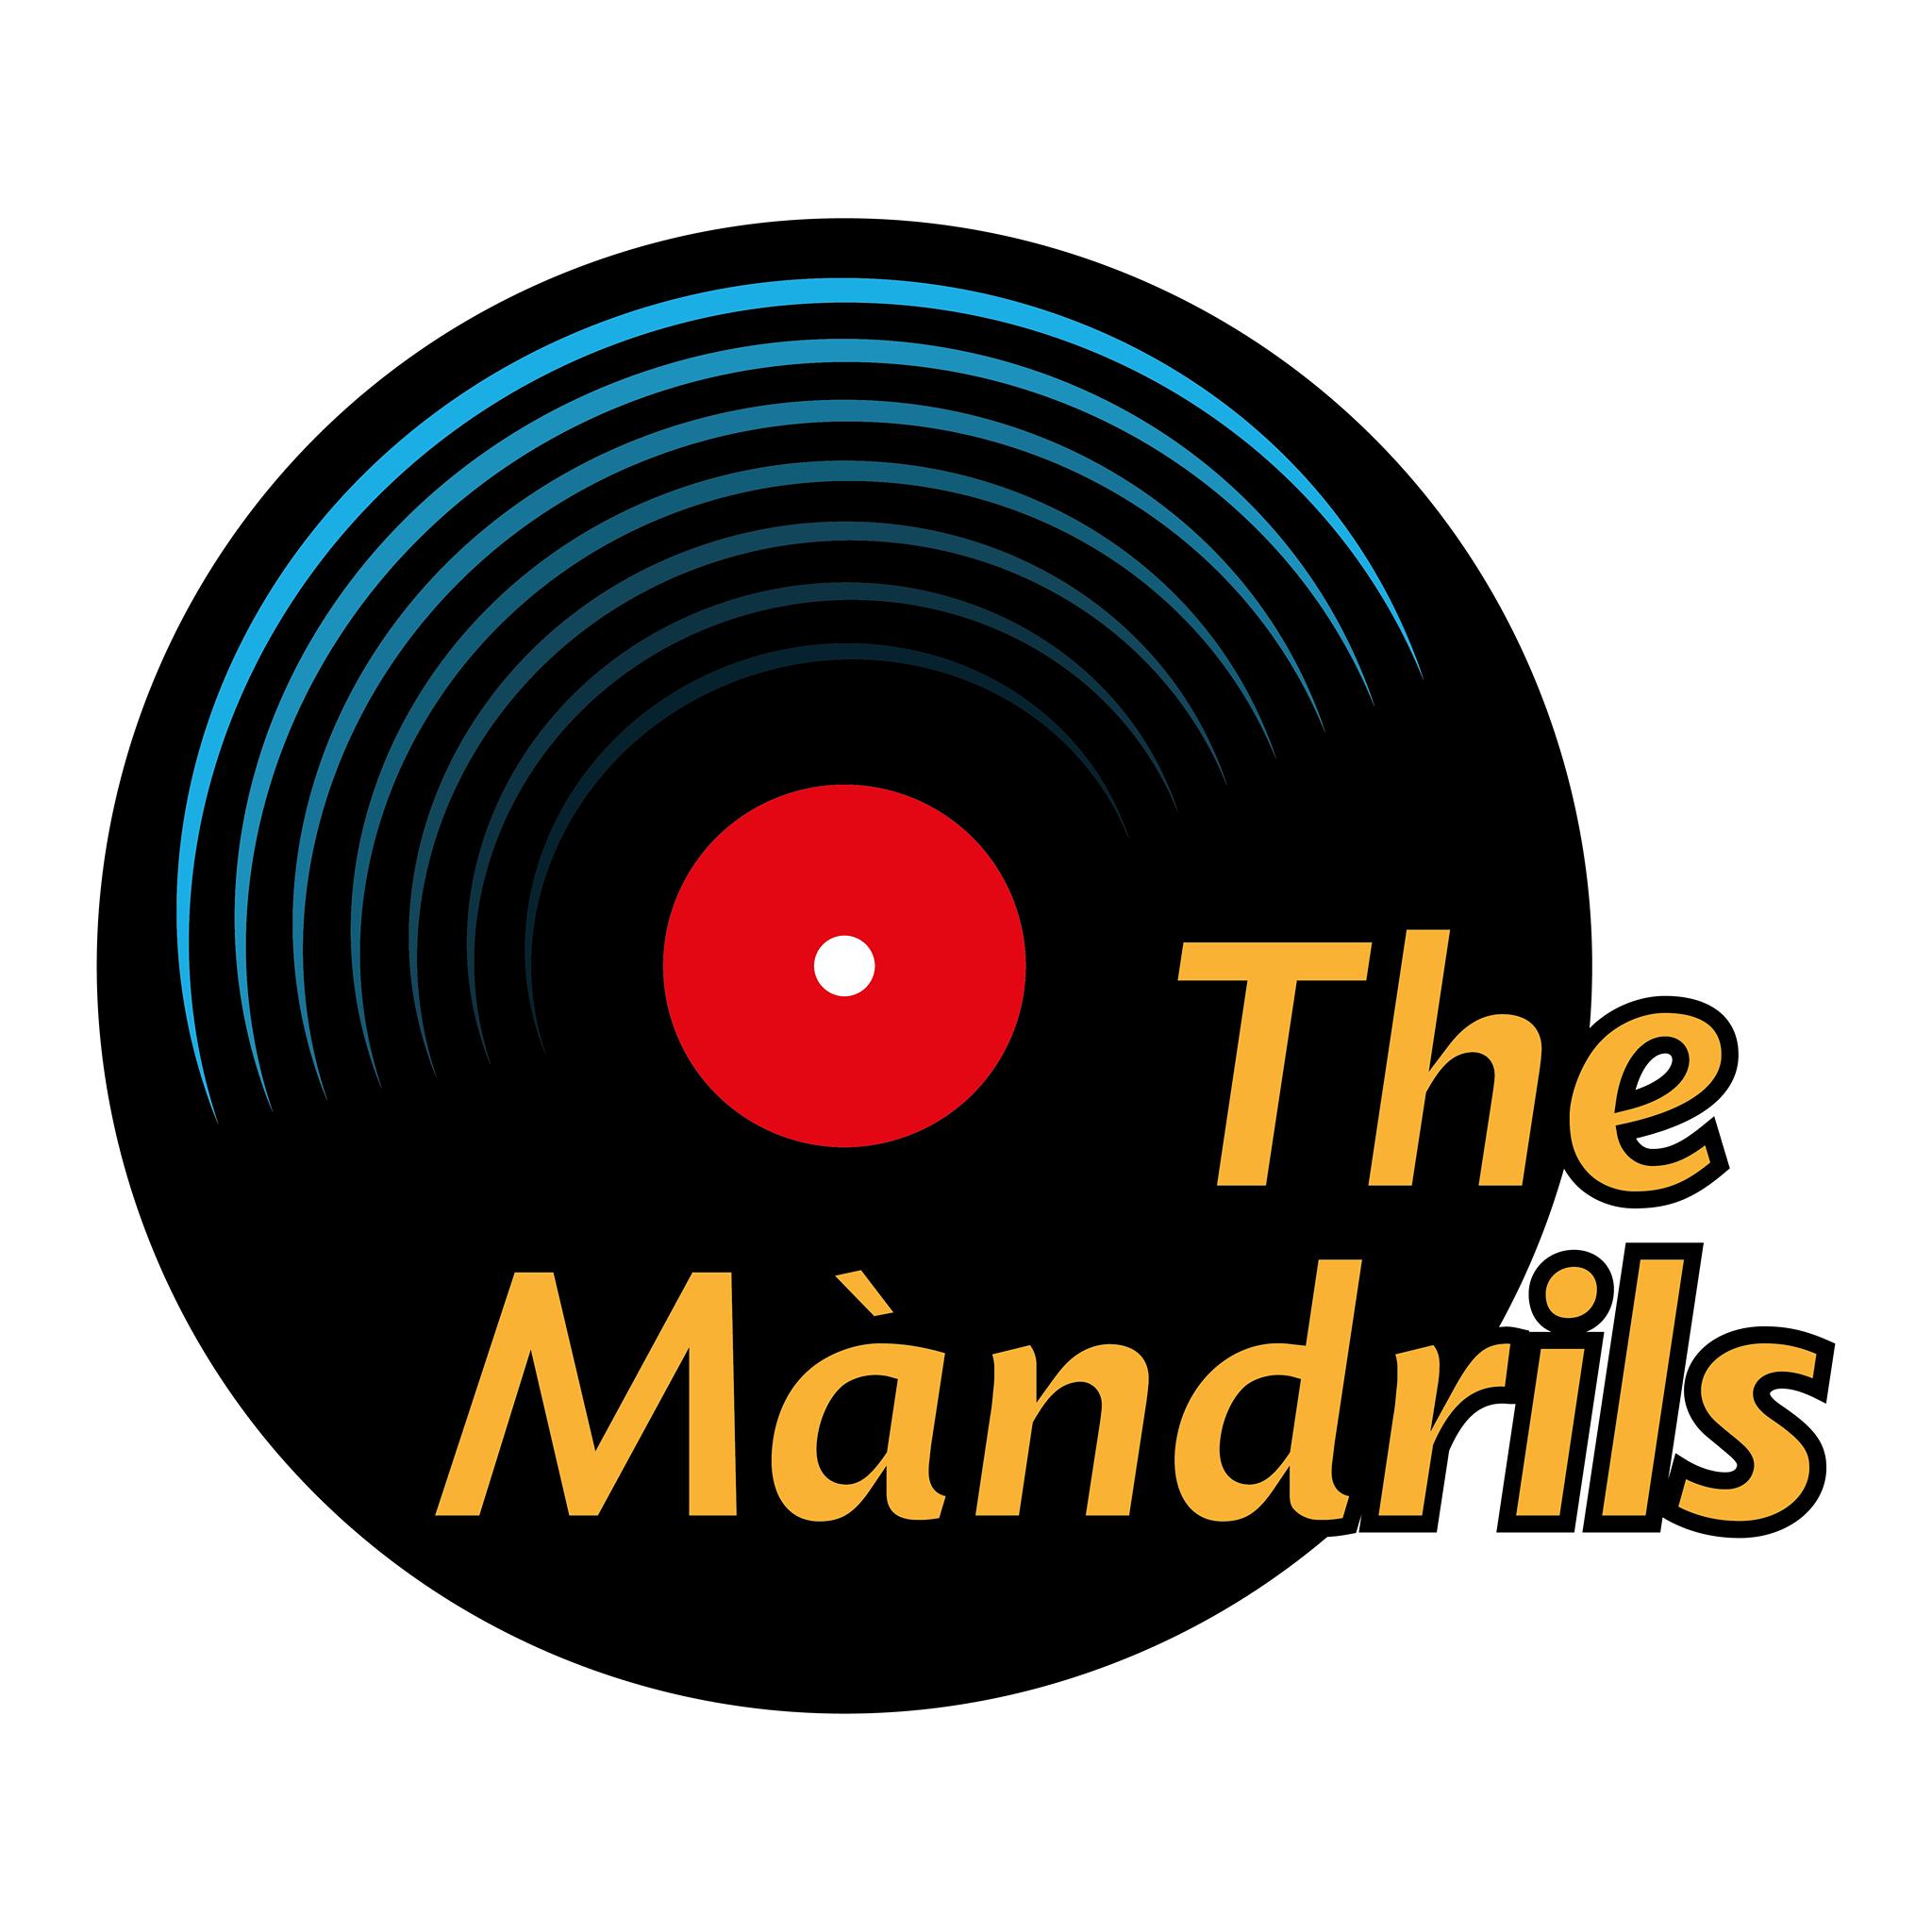 The Mandrils